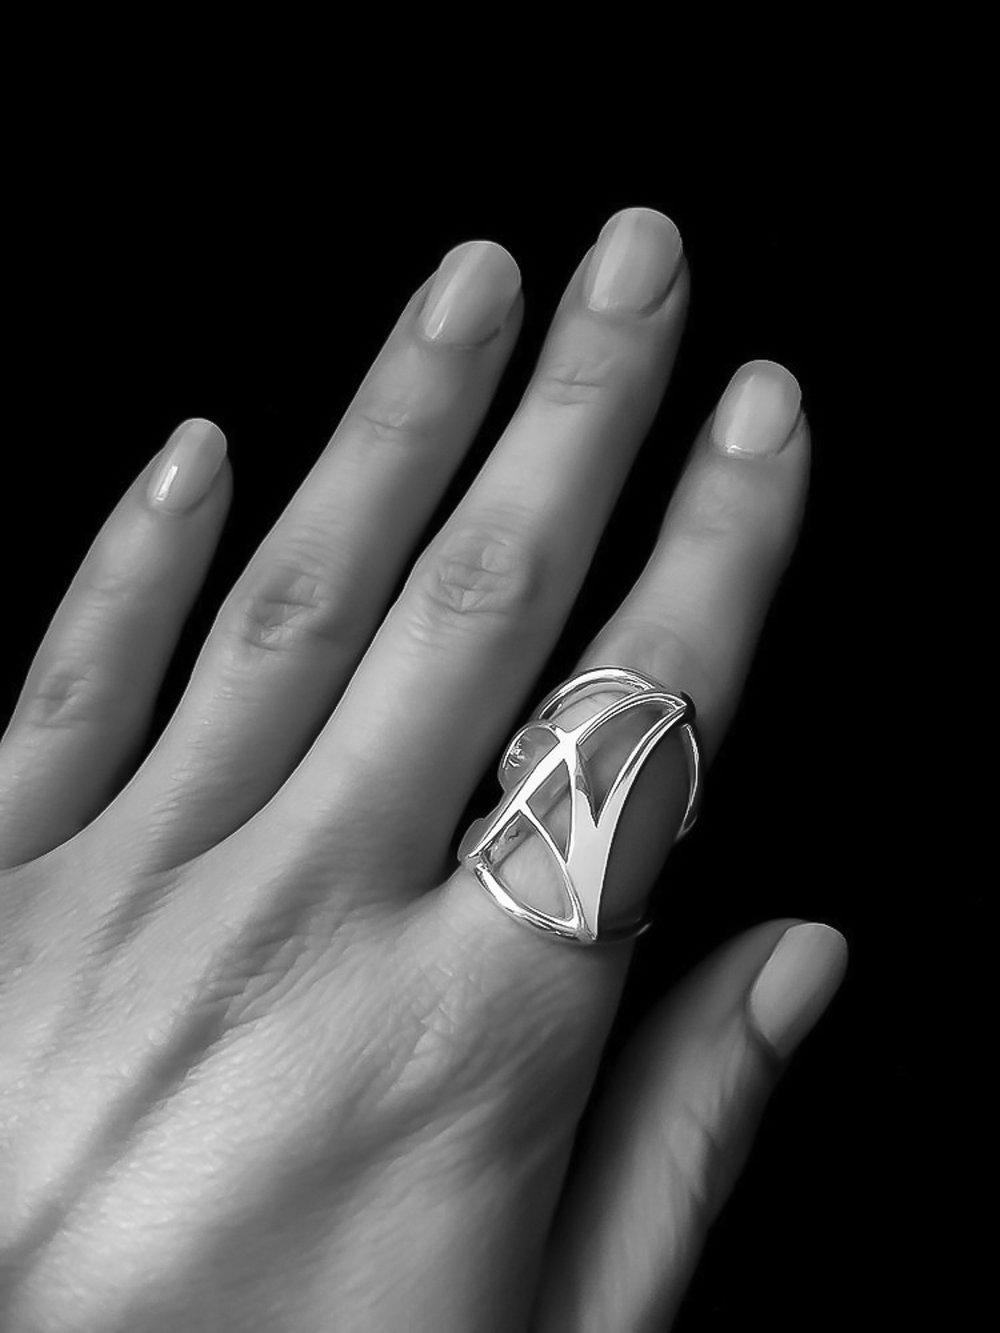 austin private jewelers v2 no watermarks.jpg